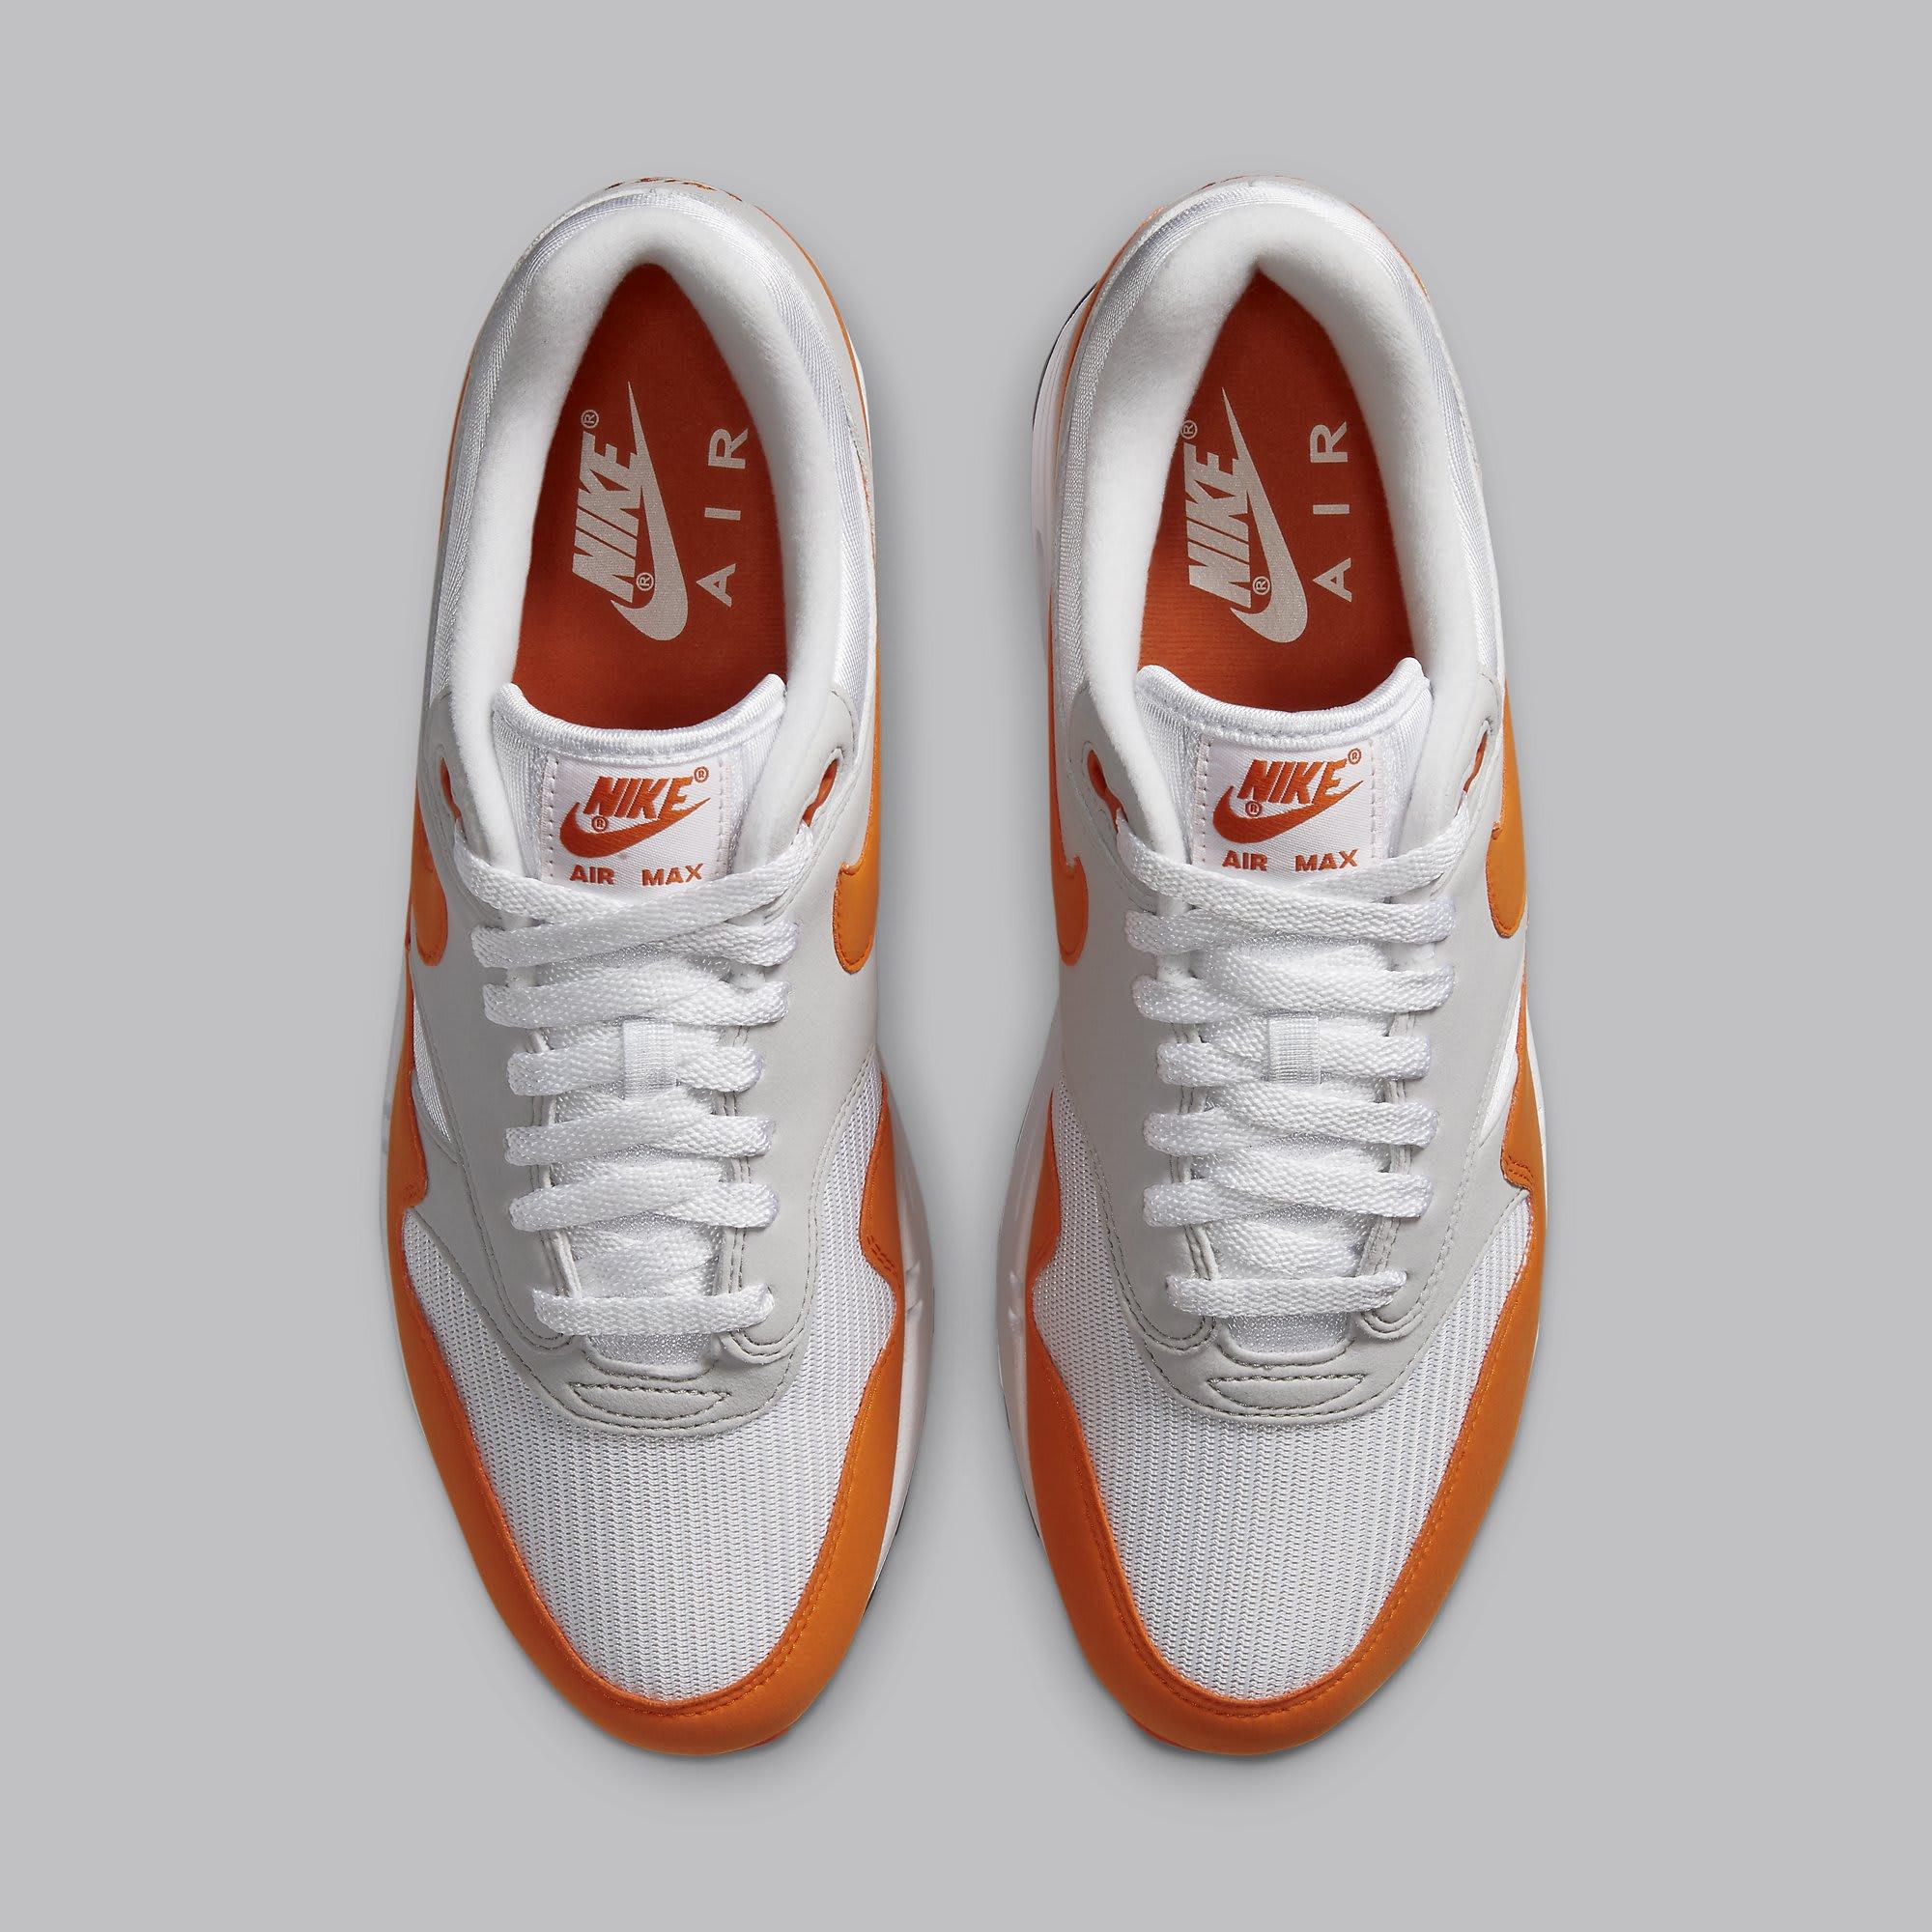 Nike Air Max 1 'Magma Orange' Release Date DC1454-101 | Sole ...